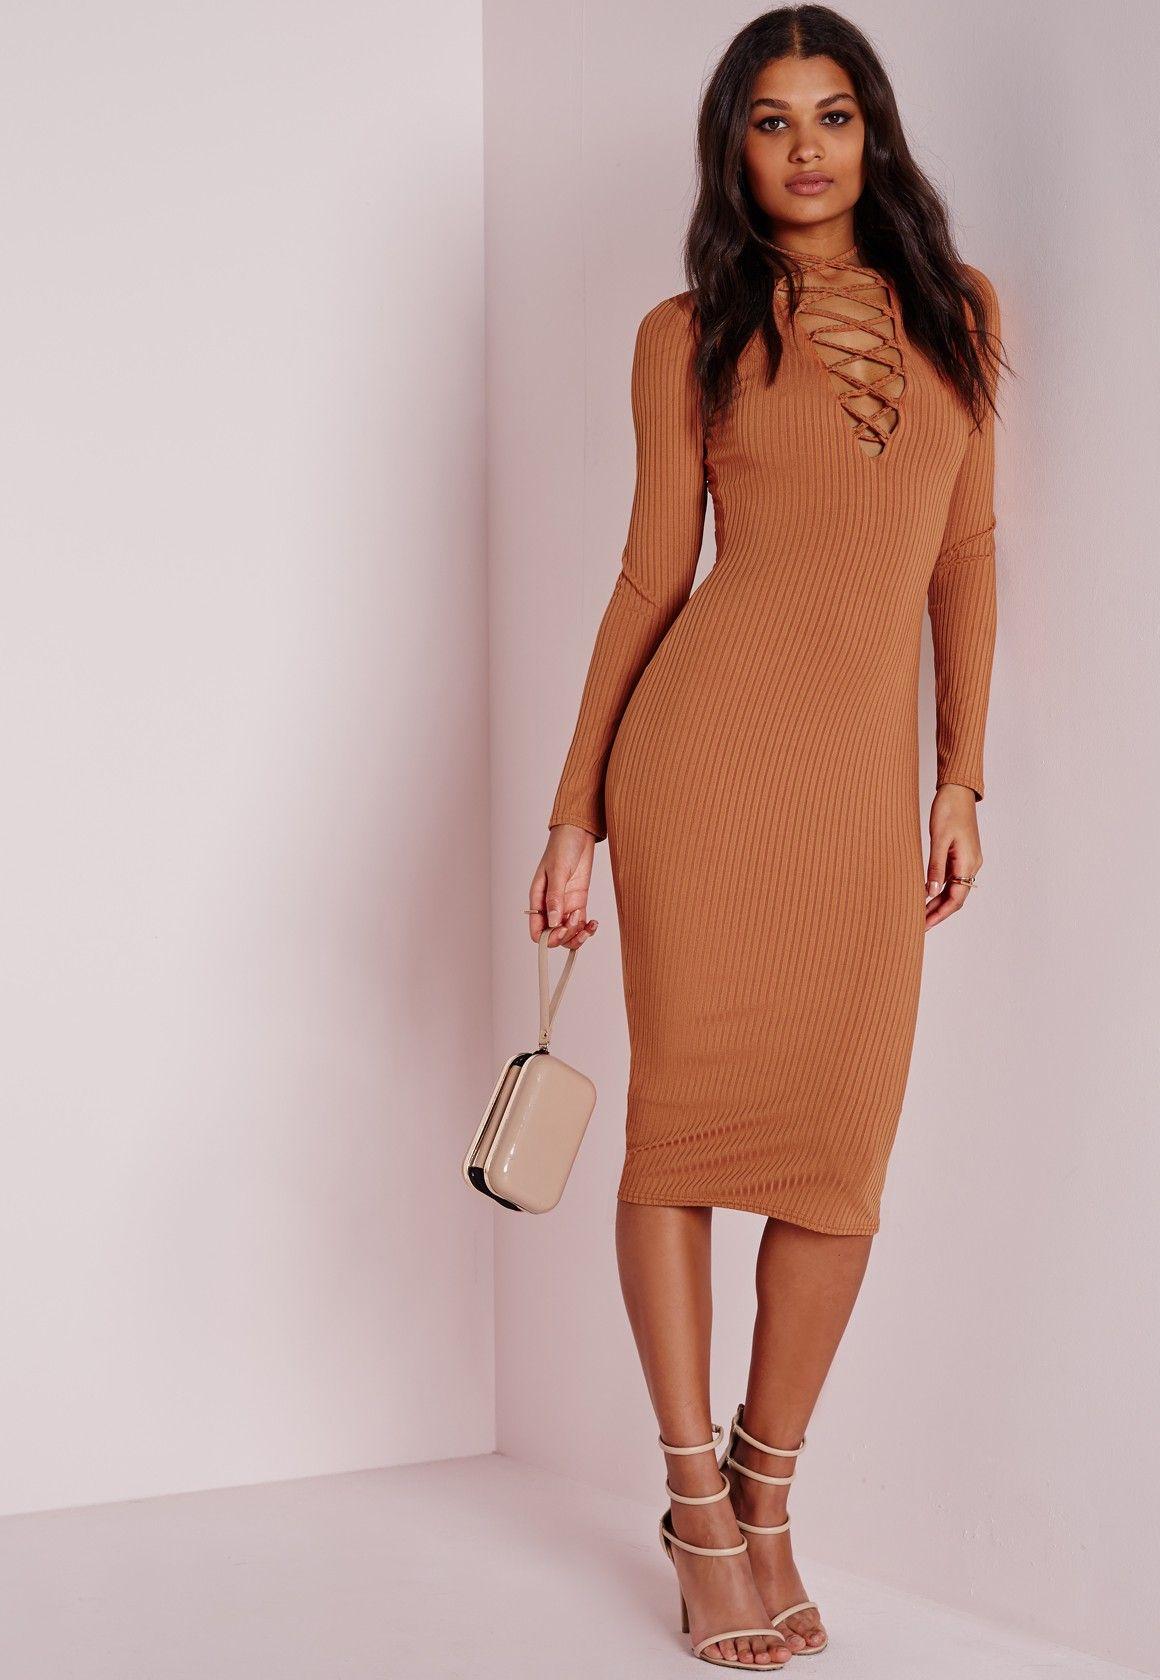 Missguided Ribbed Long Sleeve Lace Up Midi Dress Tan Trending Dresses Dresses Online Shop Dresses [ 1680 x 1160 Pixel ]